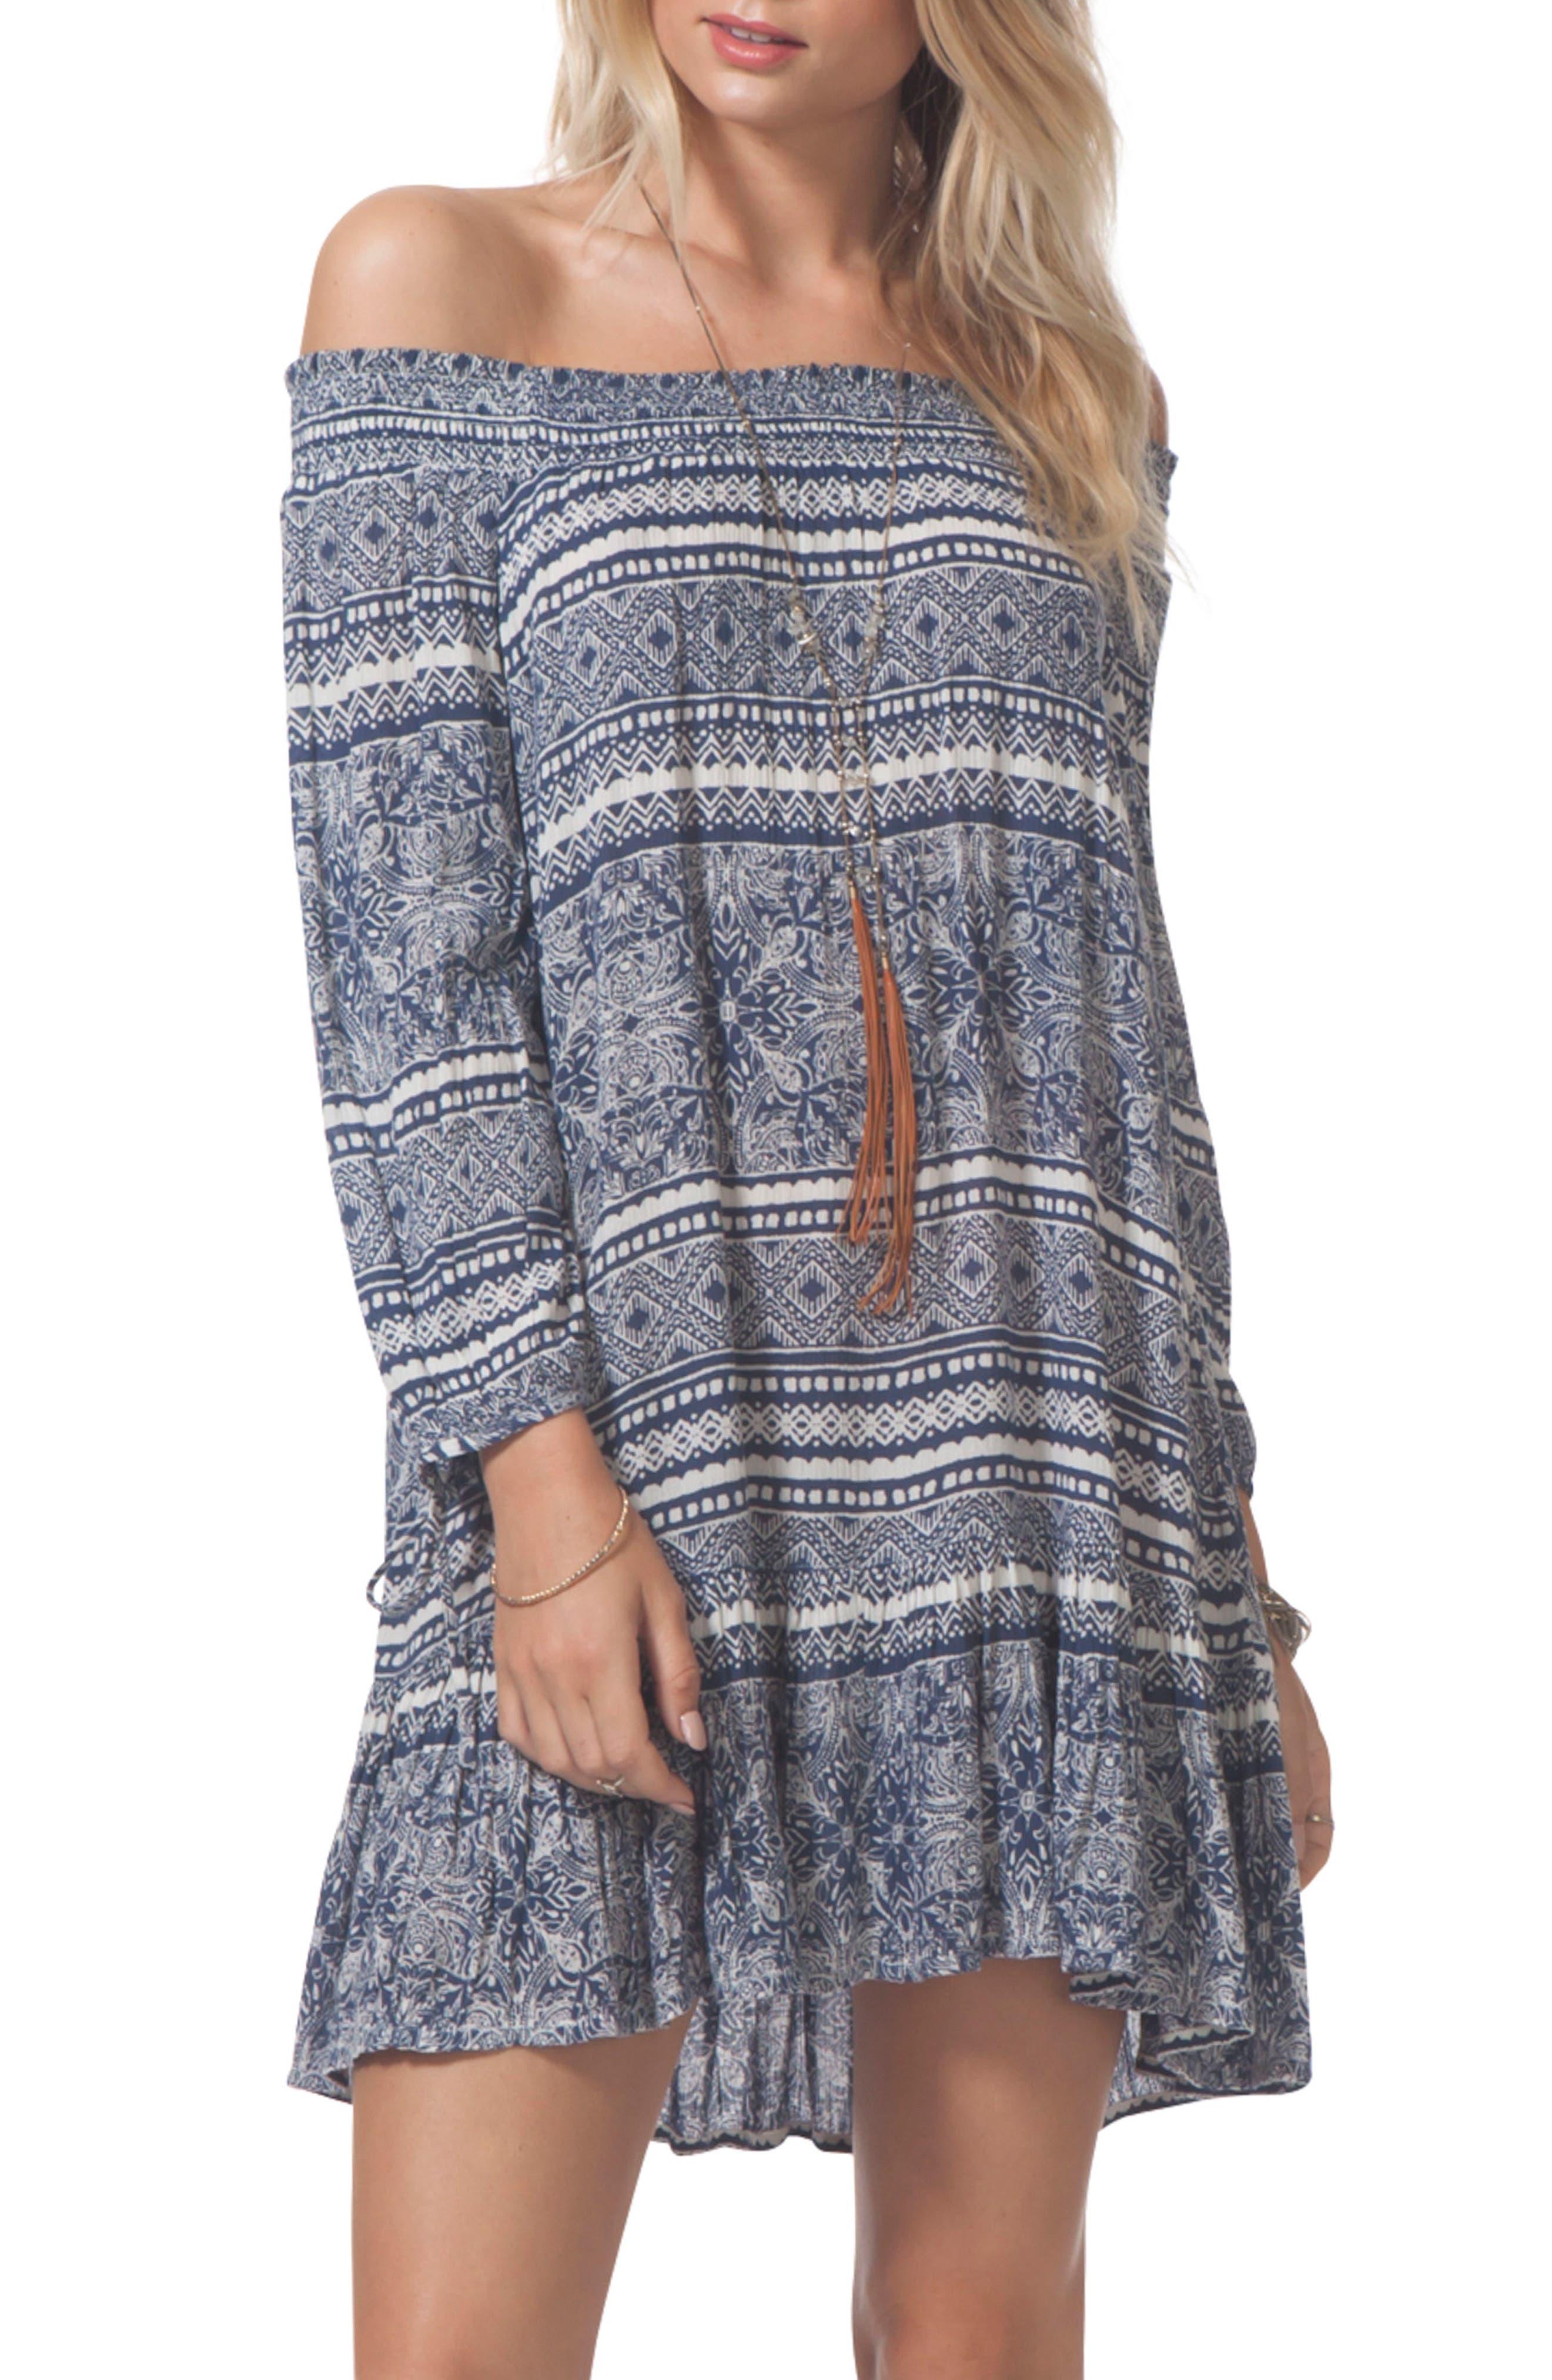 Alternate Image 1 Selected - Rip Curl Southeast Off the Shoulder Dress